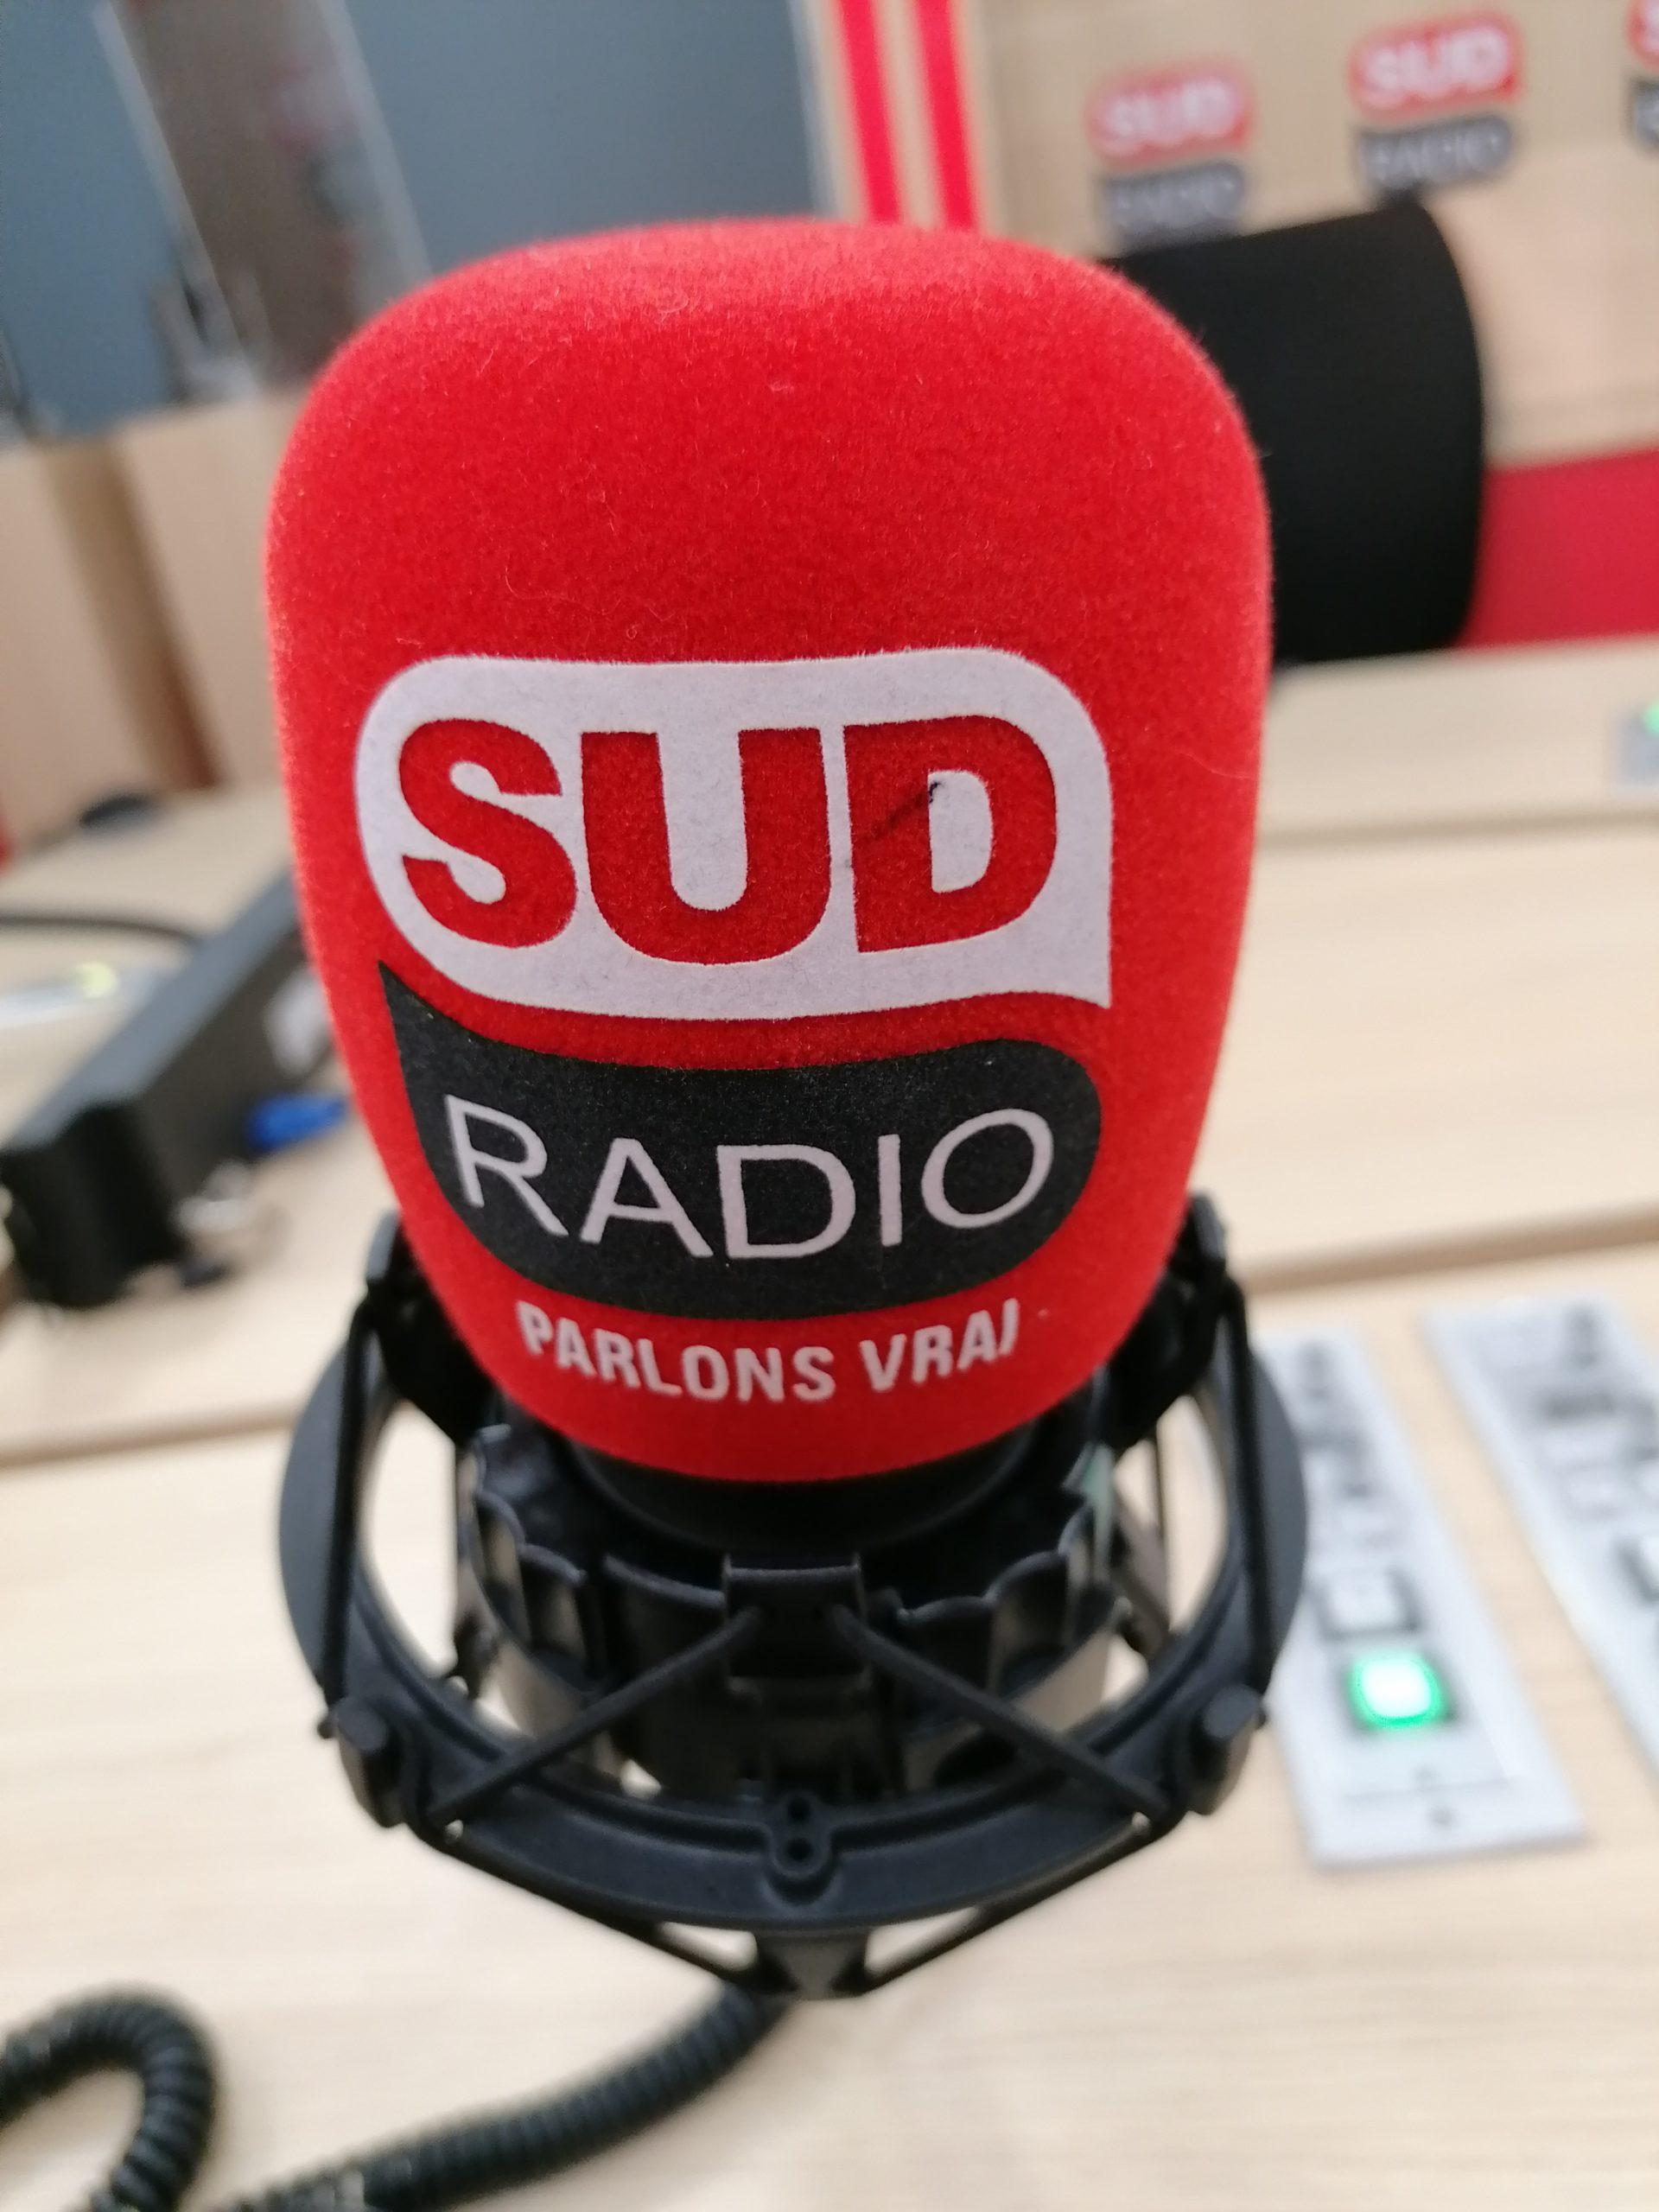 sud radio scaled